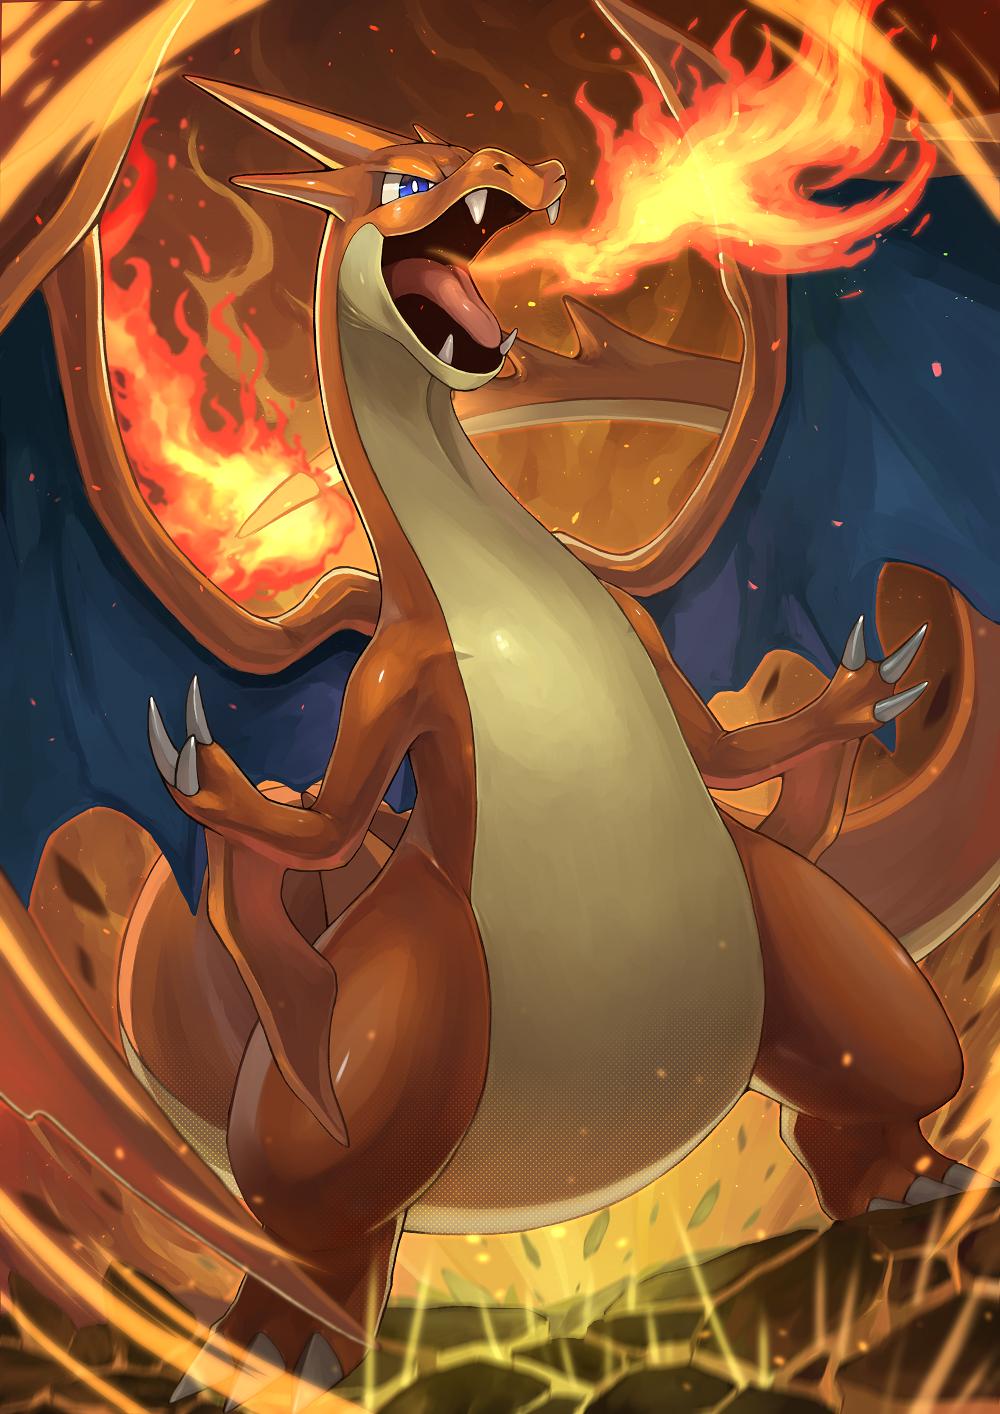 Mega Charizard By Tessy Charizard Art Cool Pokemon Wallpapers Charmeleon Pokemon